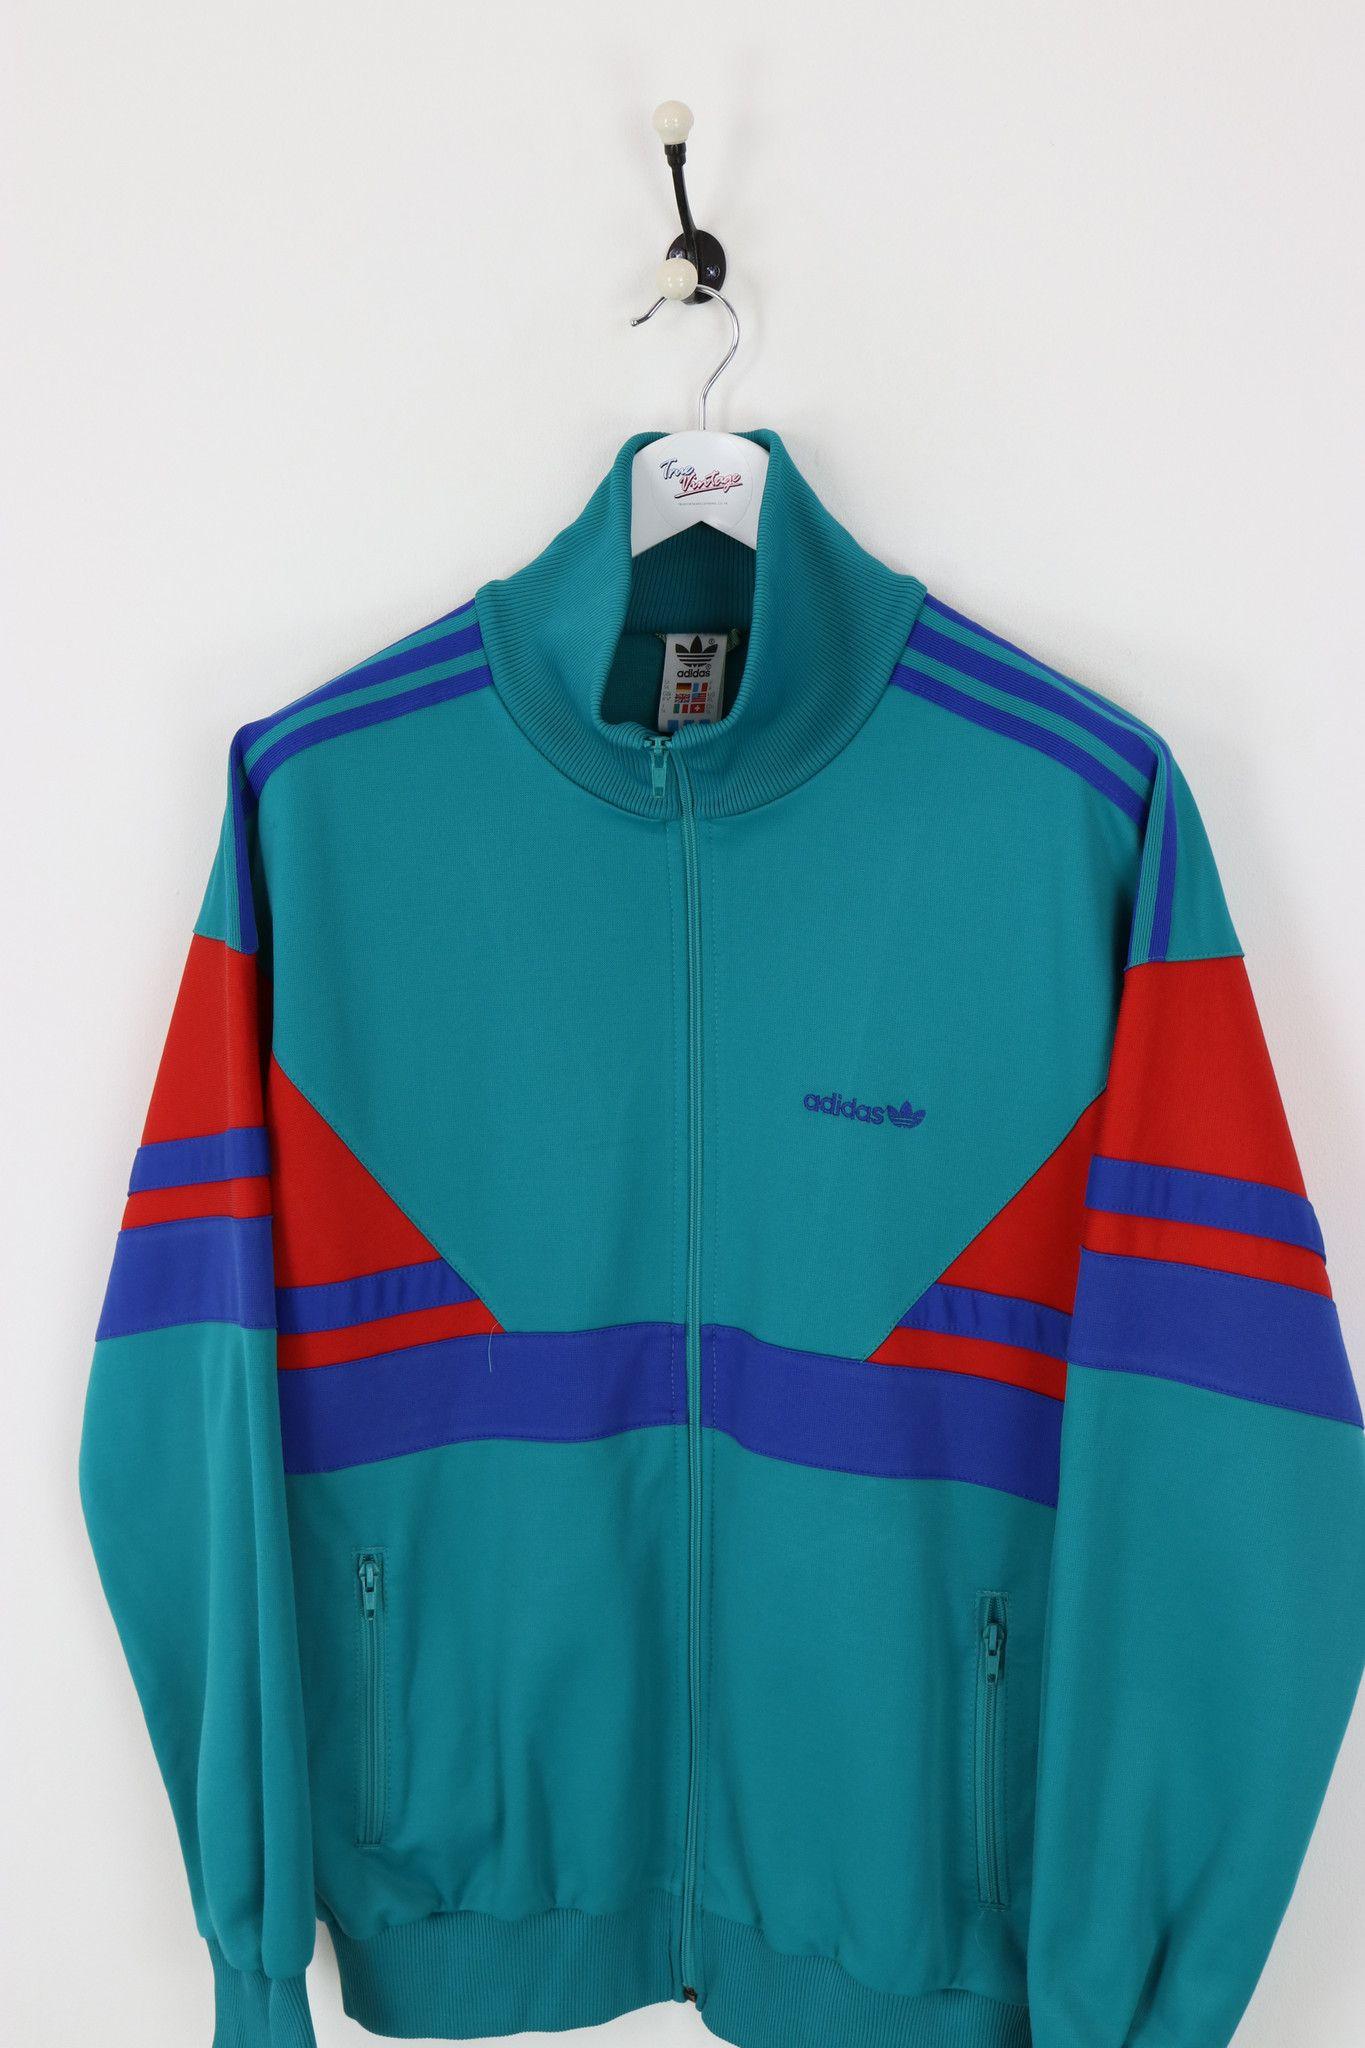 Vintage Adidas Originals Wolle Bomber Jacke   Herren S